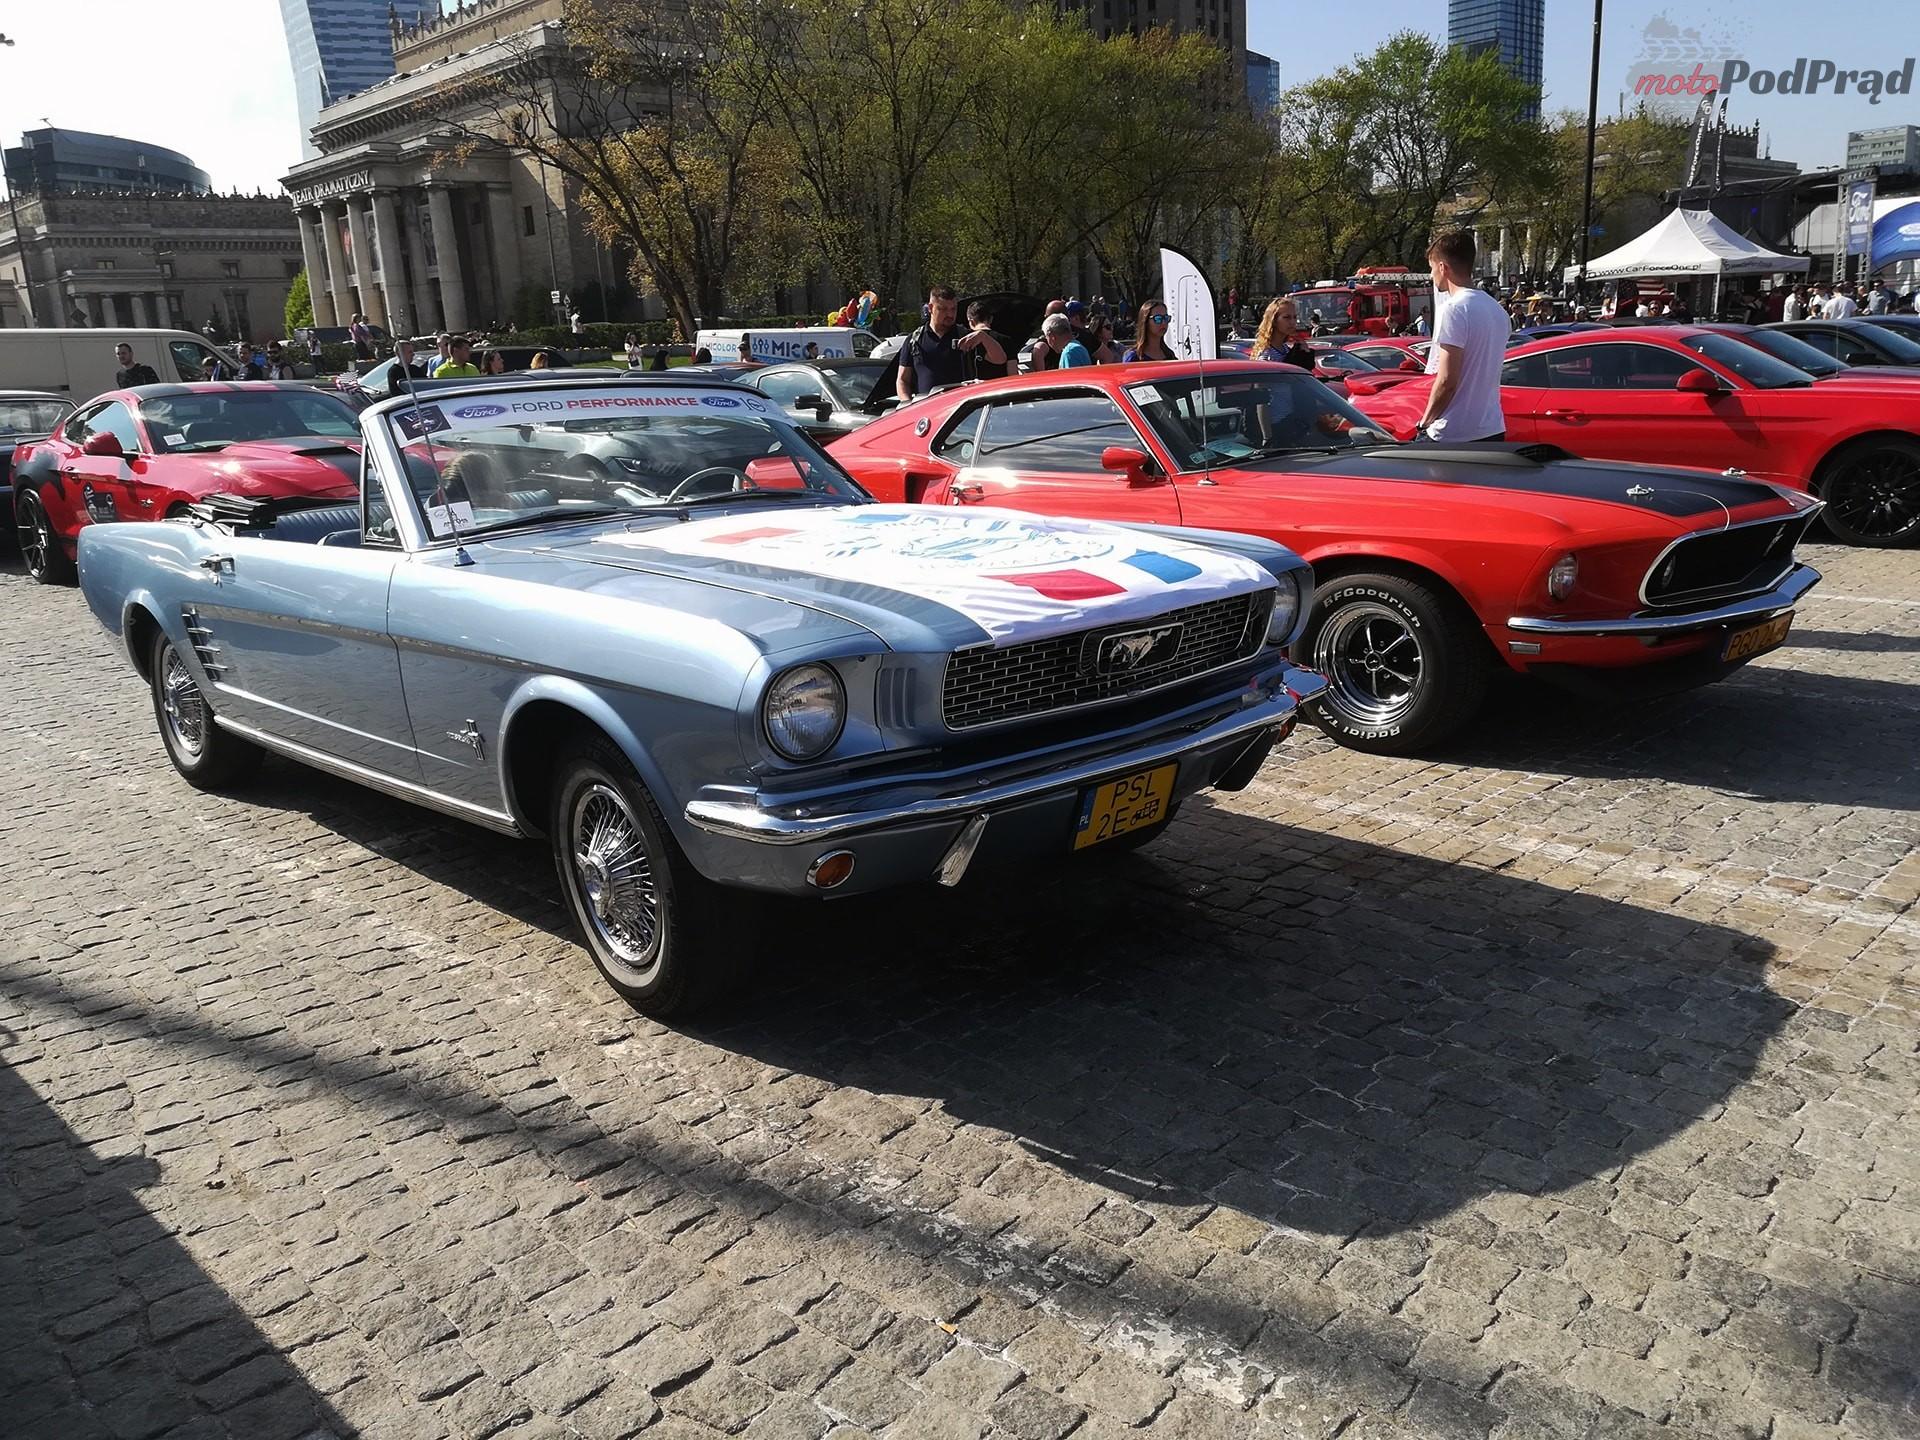 X zlot Ford Mustang Polska 4 X Zlot Mustang Klub Polska czyli stare i najnowsze Mustangi